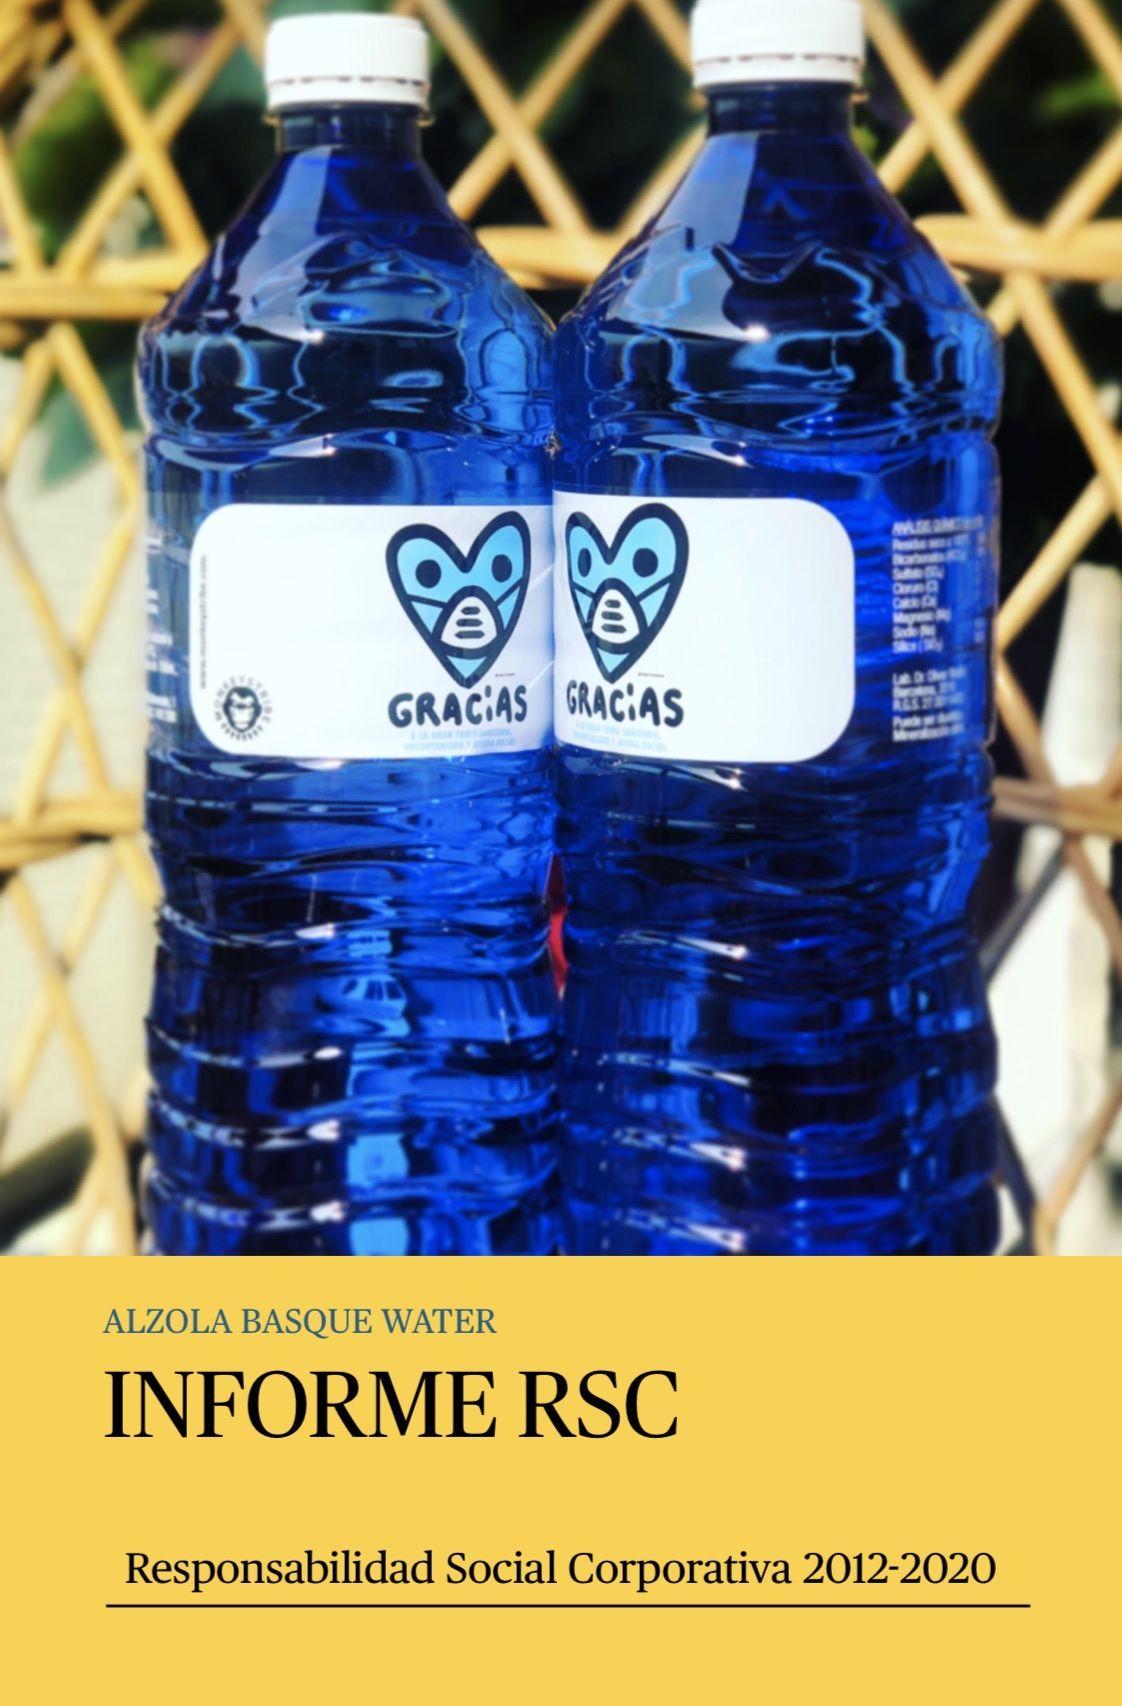 Alzola Basque Water Responsabilidad Social Corporativa